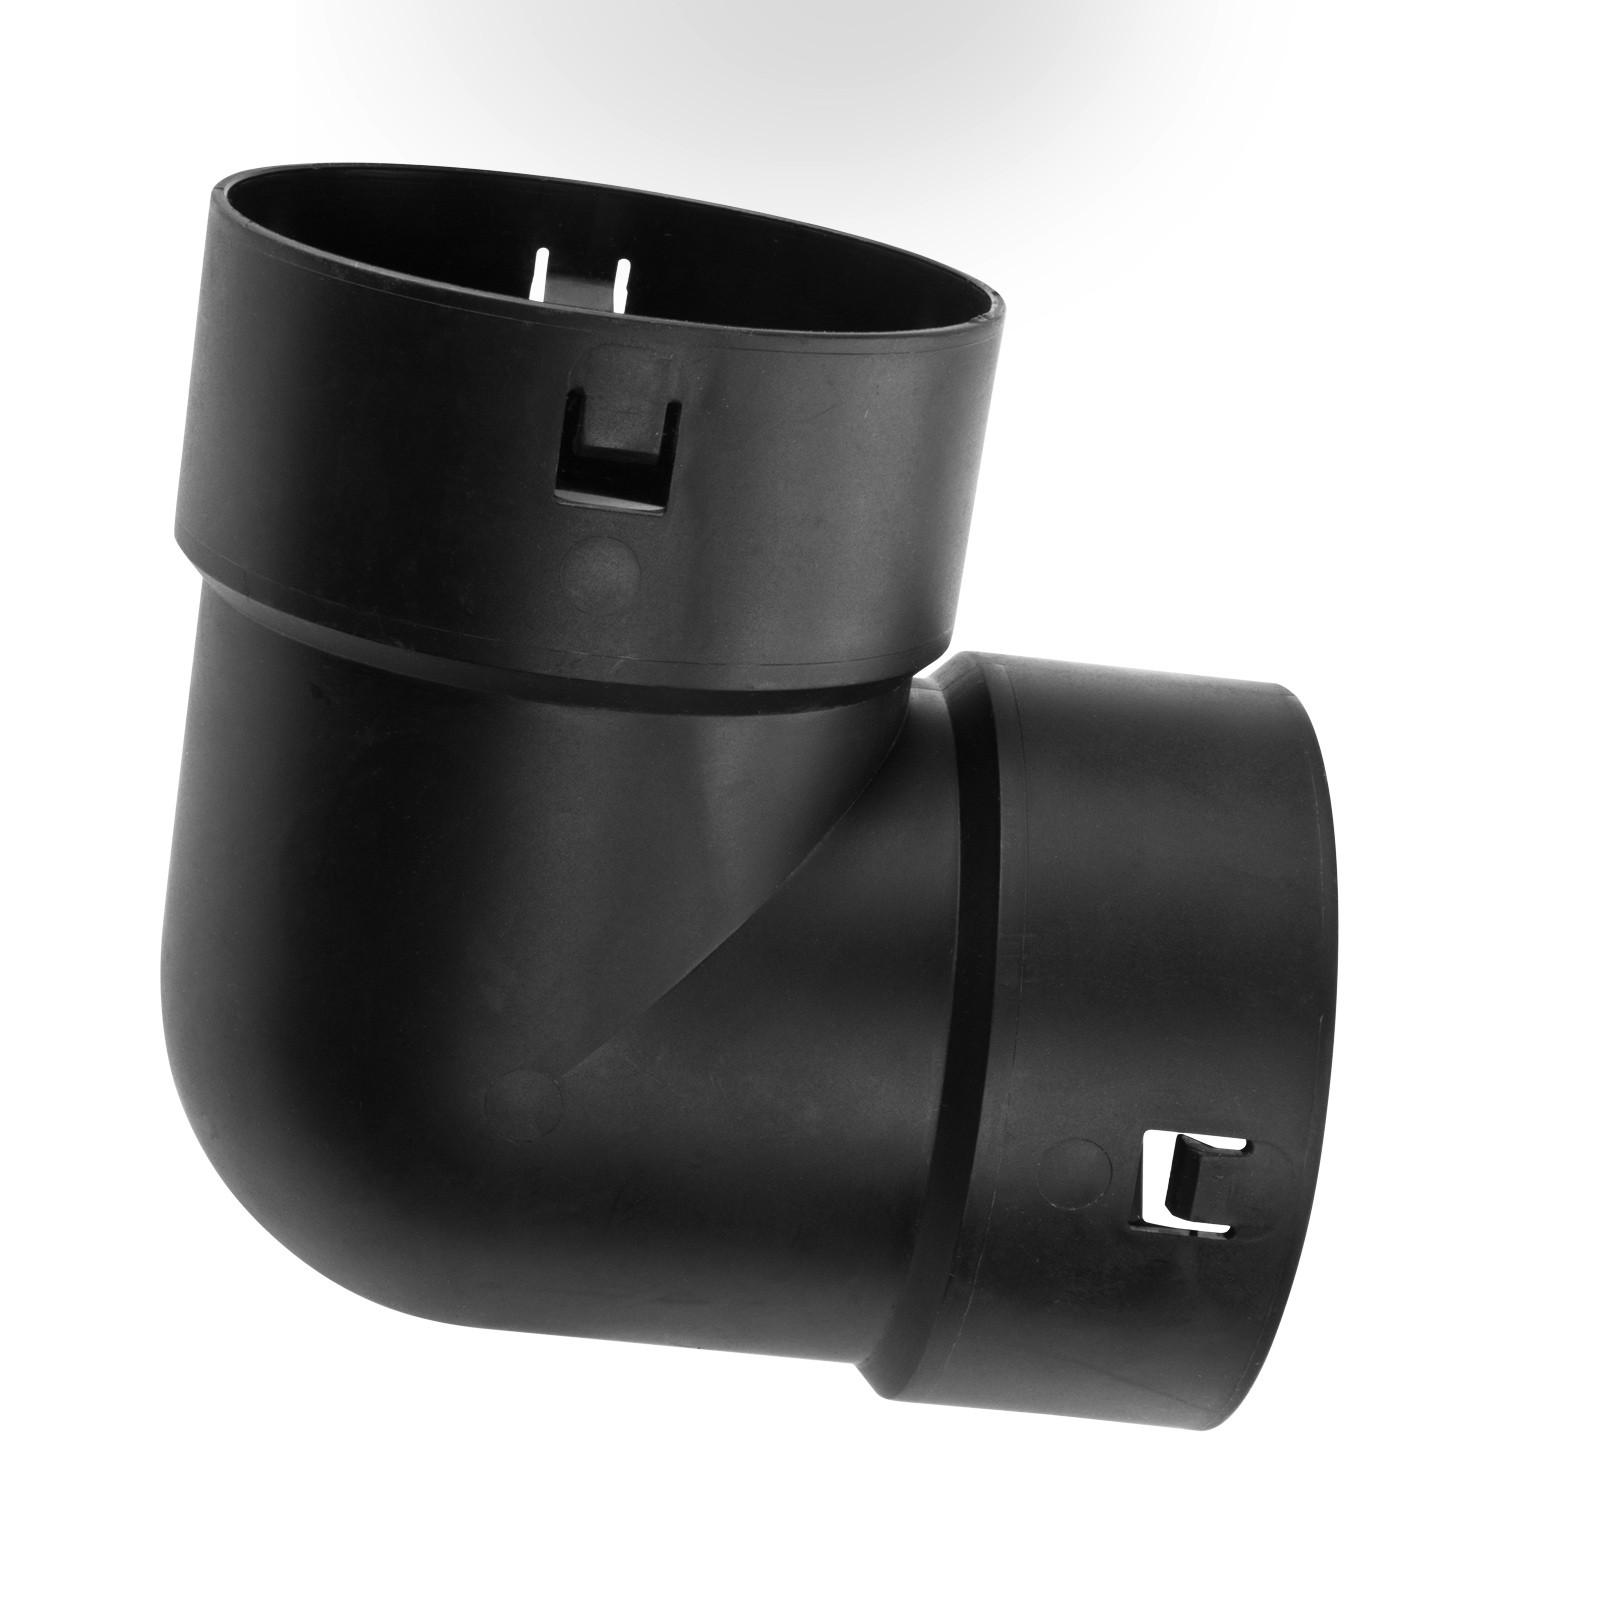 winkelst ck dn 100 winkel drainagerohr drainageschlauch. Black Bedroom Furniture Sets. Home Design Ideas